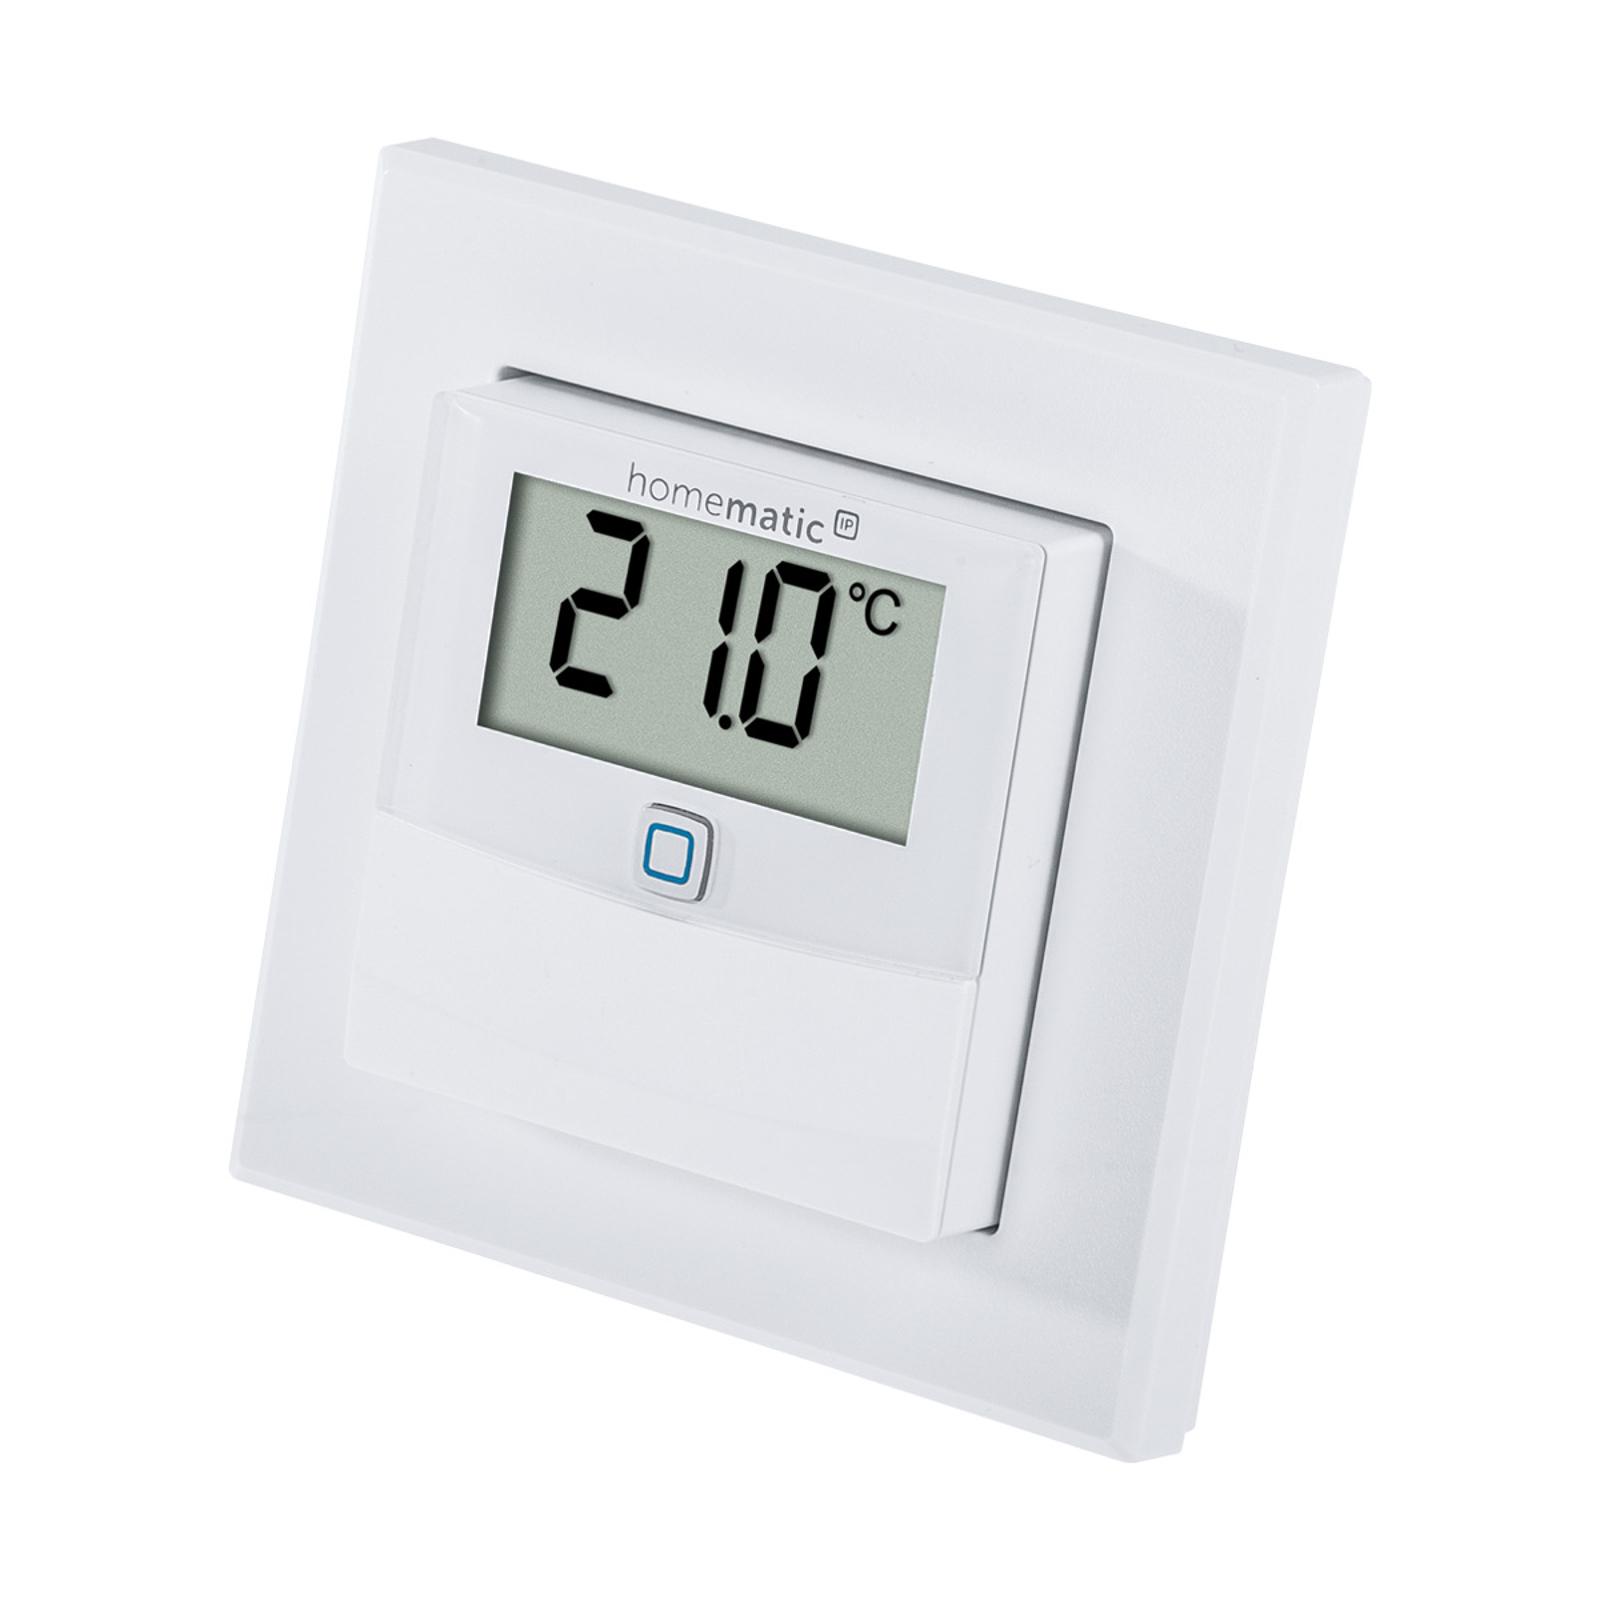 Homematic IP-temperatuur-/luchtvochtsensor scherm